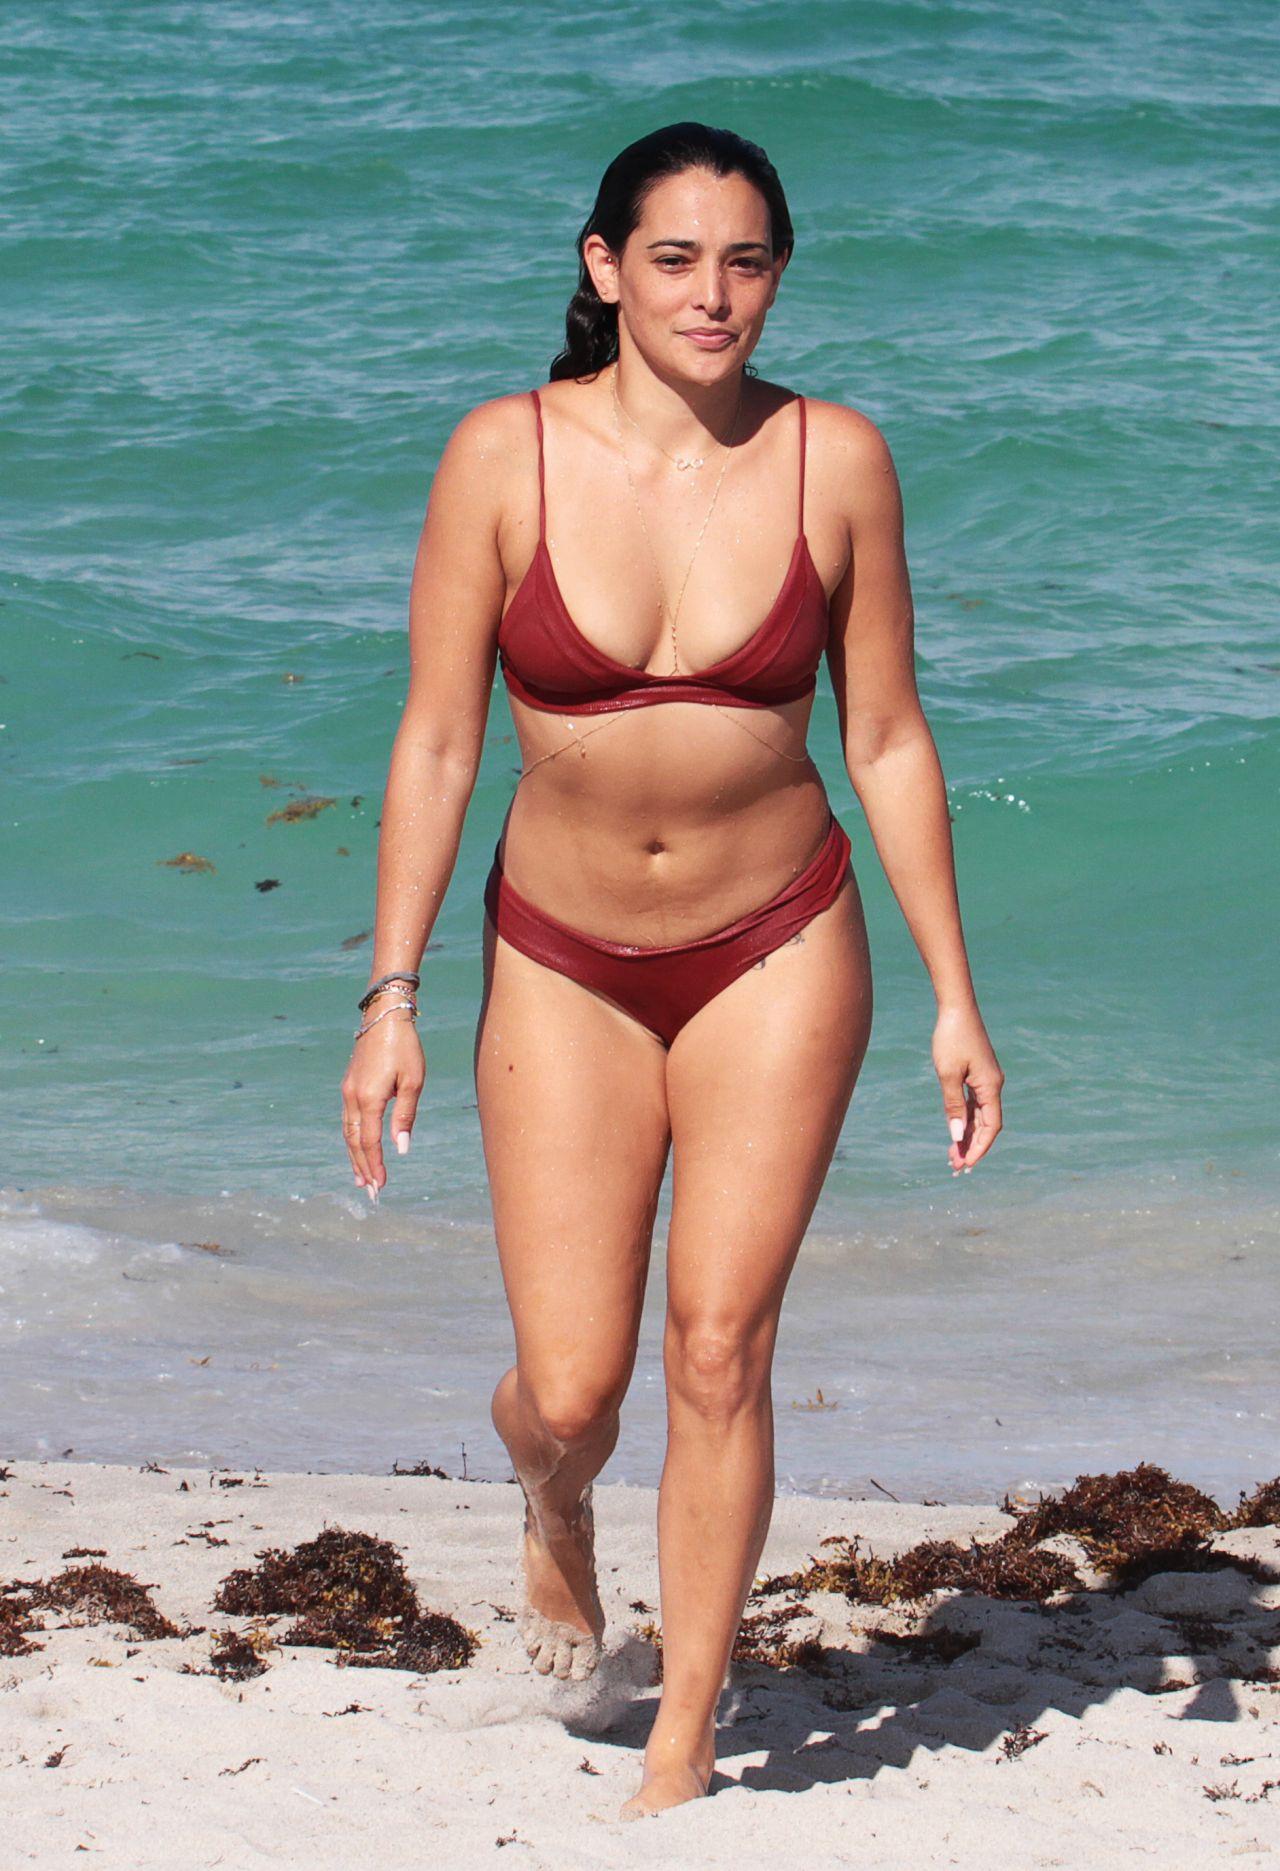 Natalie Martinez in Bikini - Miami Beach, Florida 07/08 ...